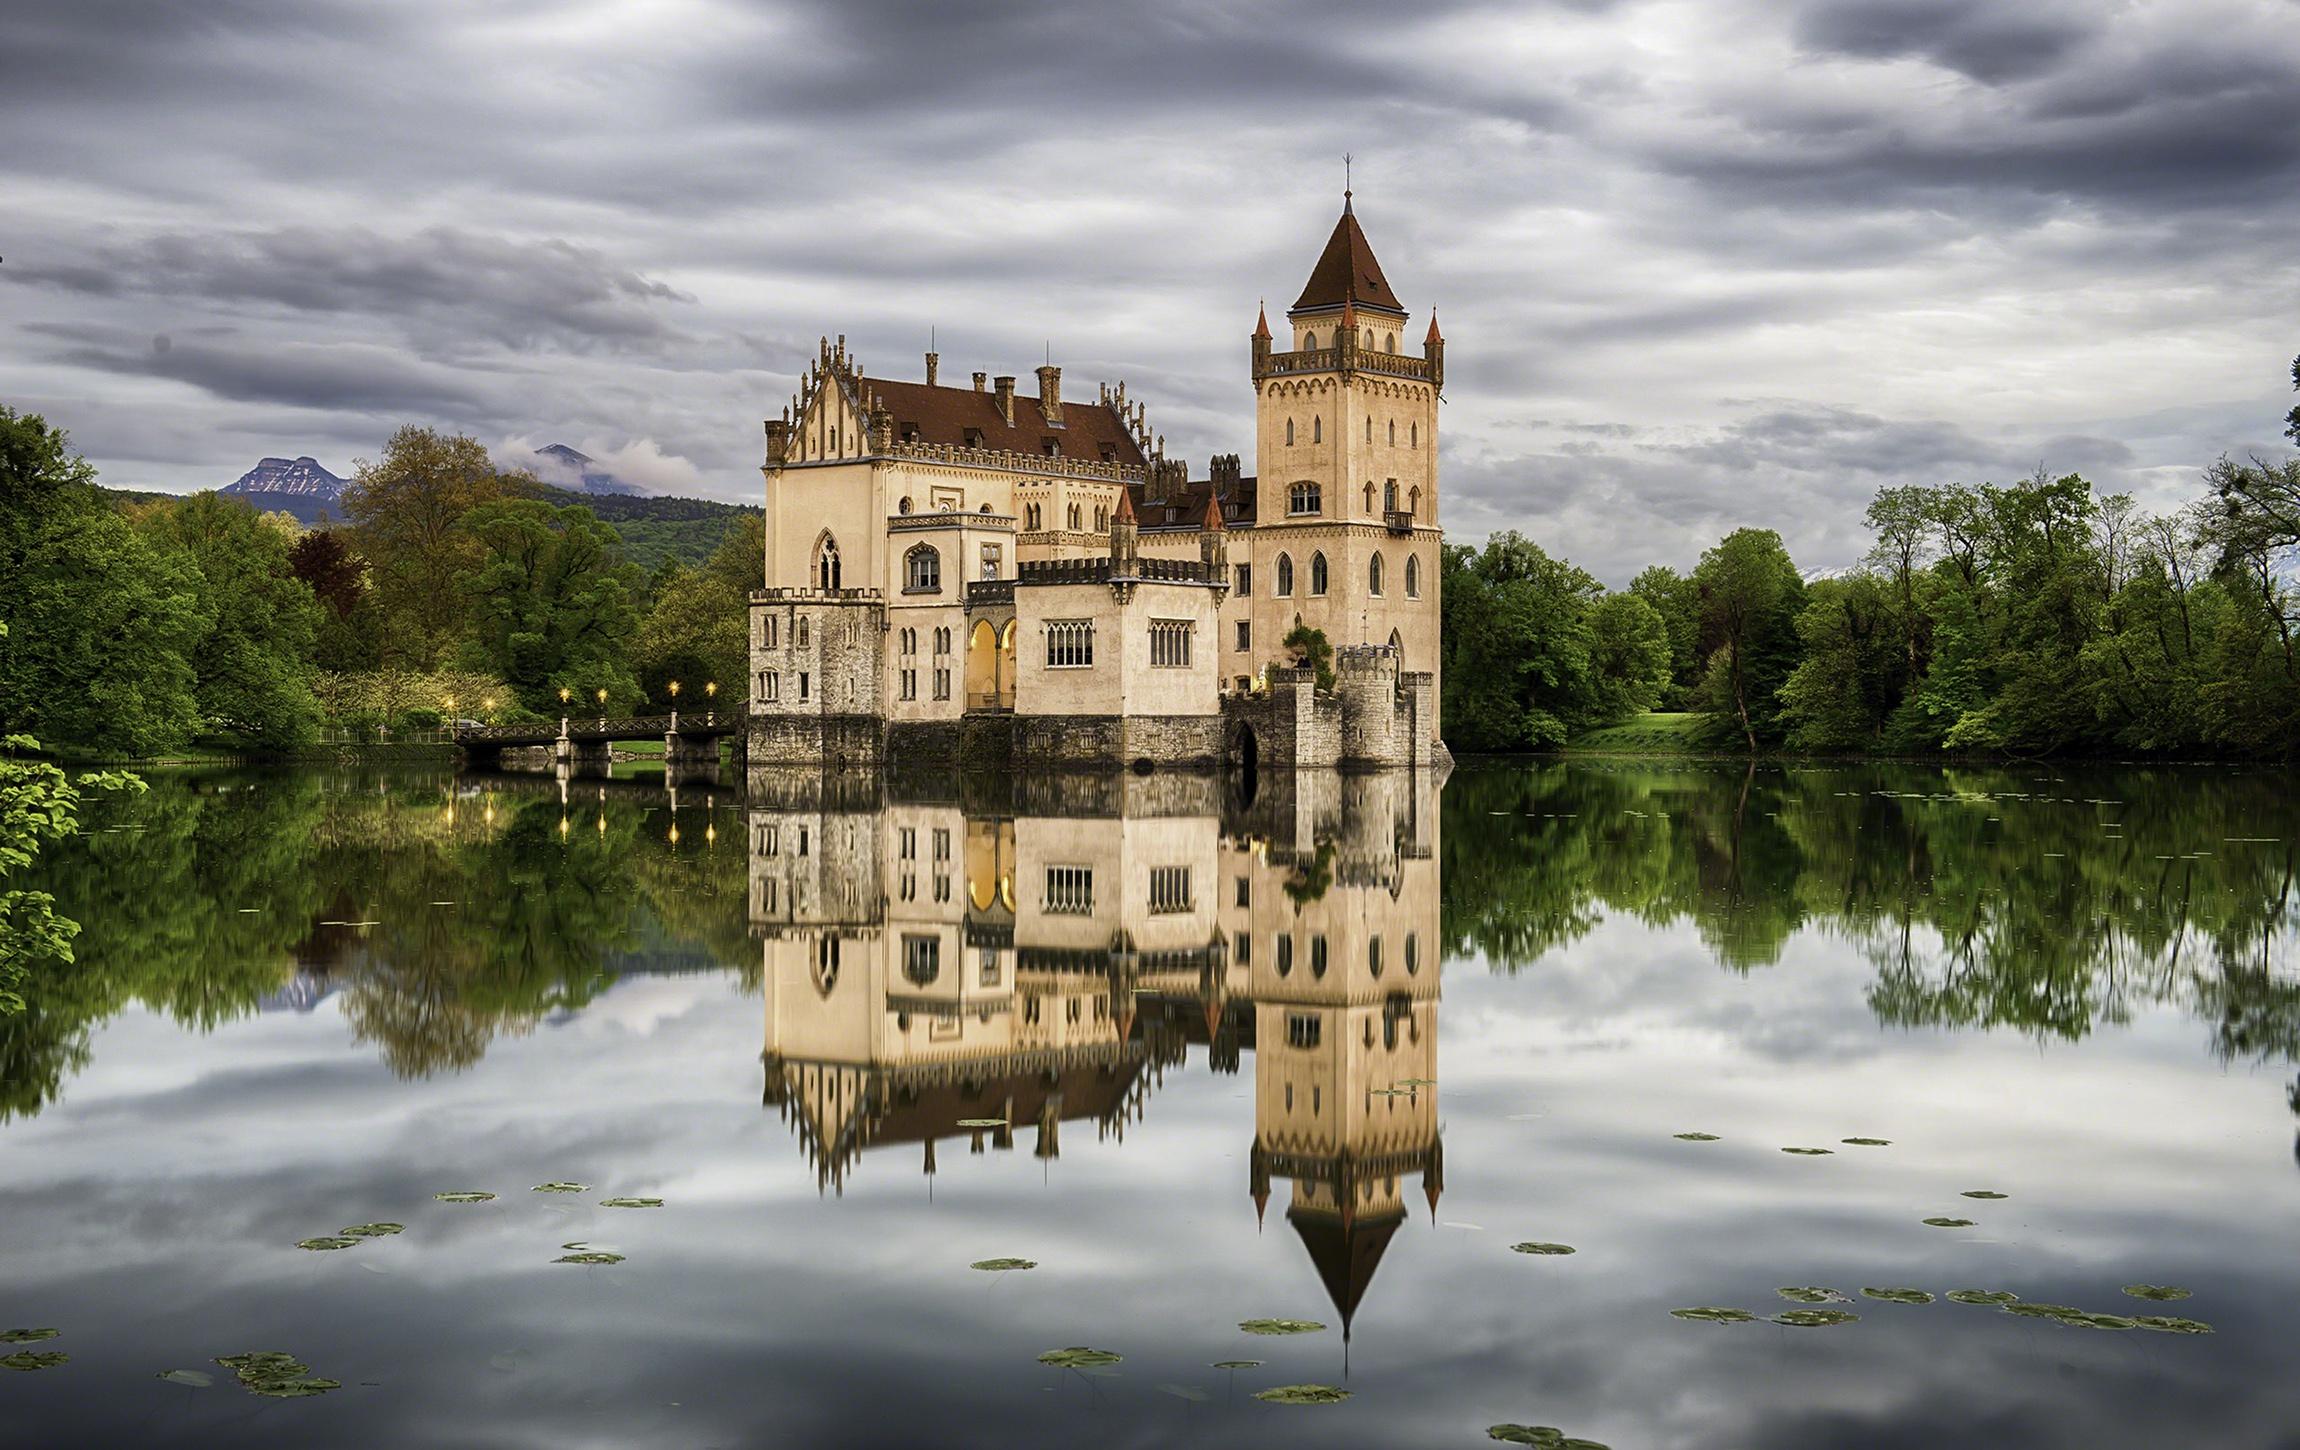 Building Castle Lake Reflection 2300x1450